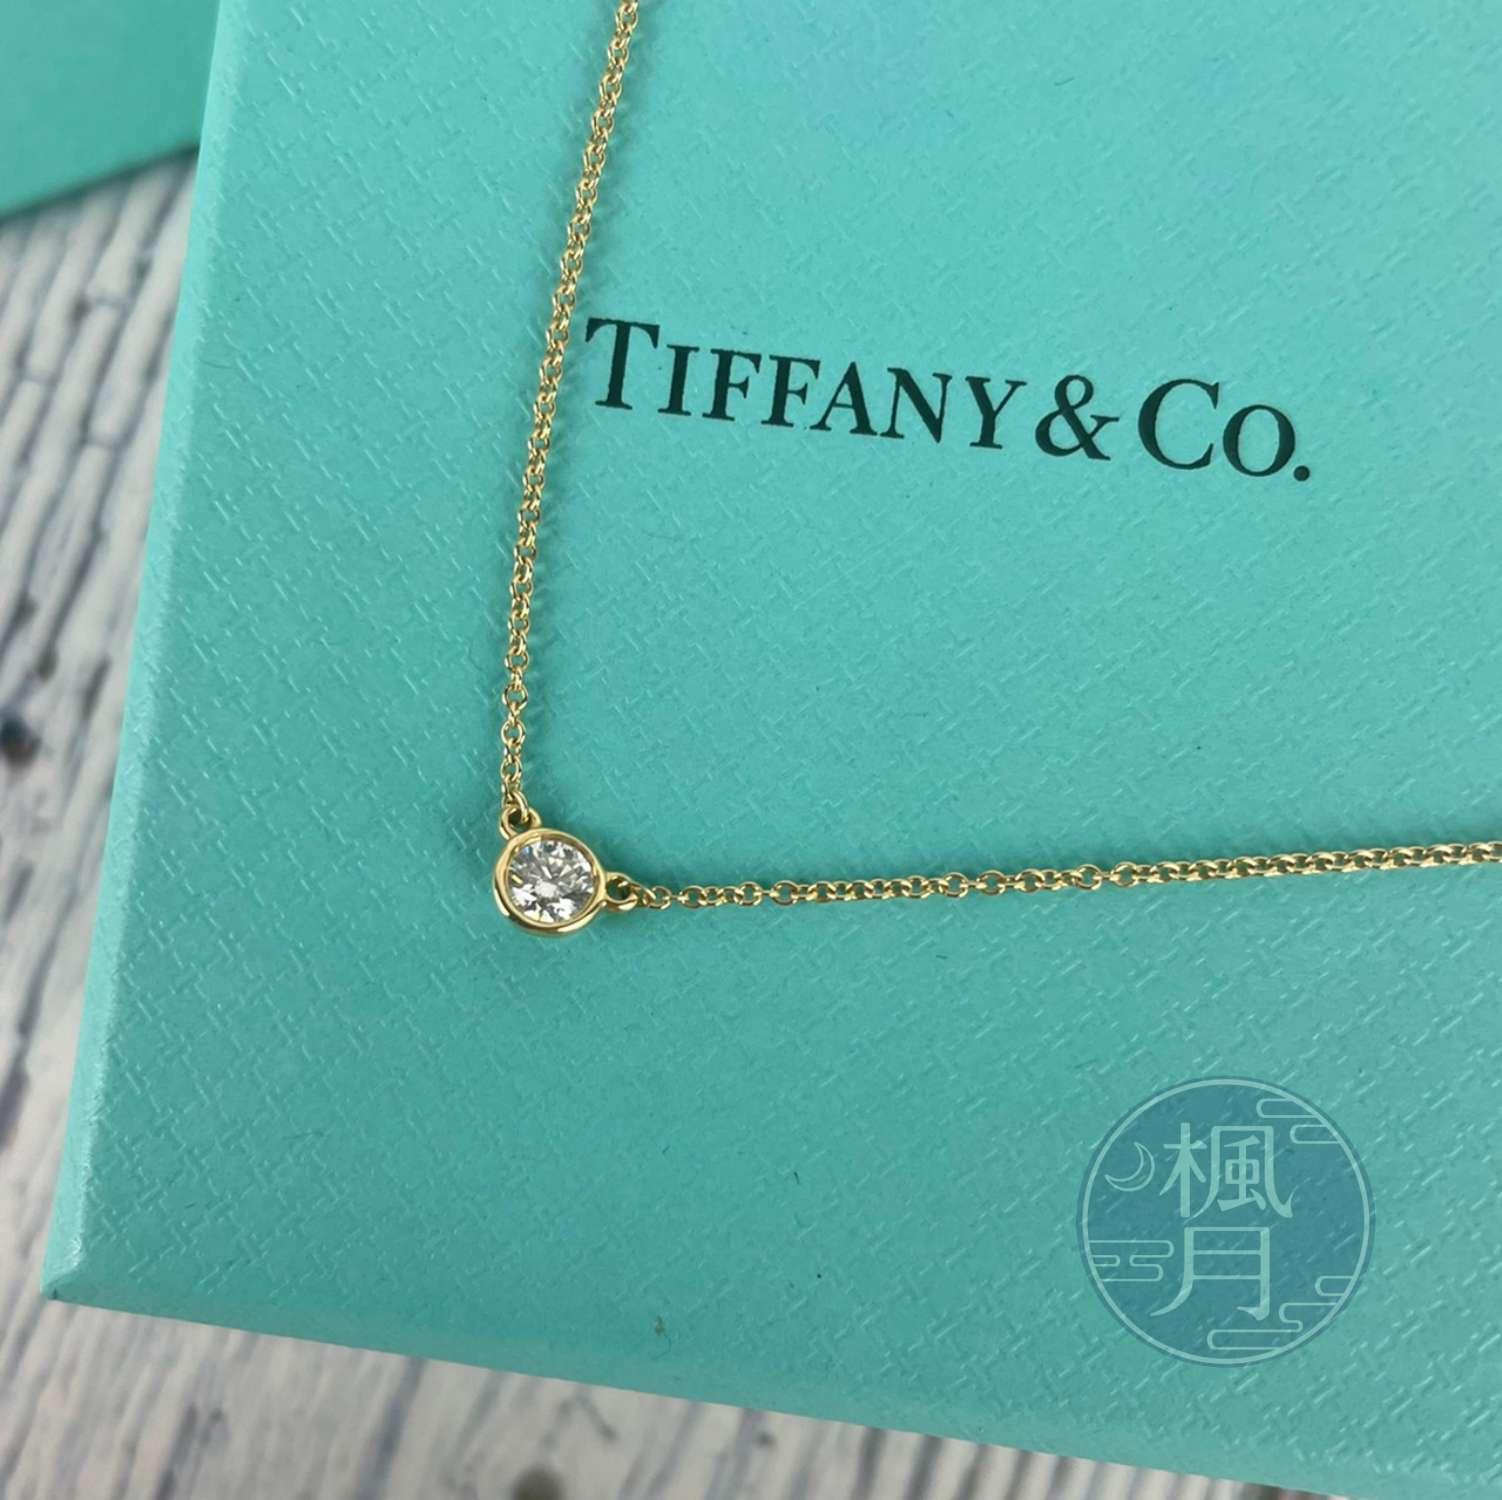 BRAND楓月 TIFFANY&CO. 蒂芬妮 0.17CT 單鑽項鍊 金鍊 圓造型鑽石 飾品 配件 配飾